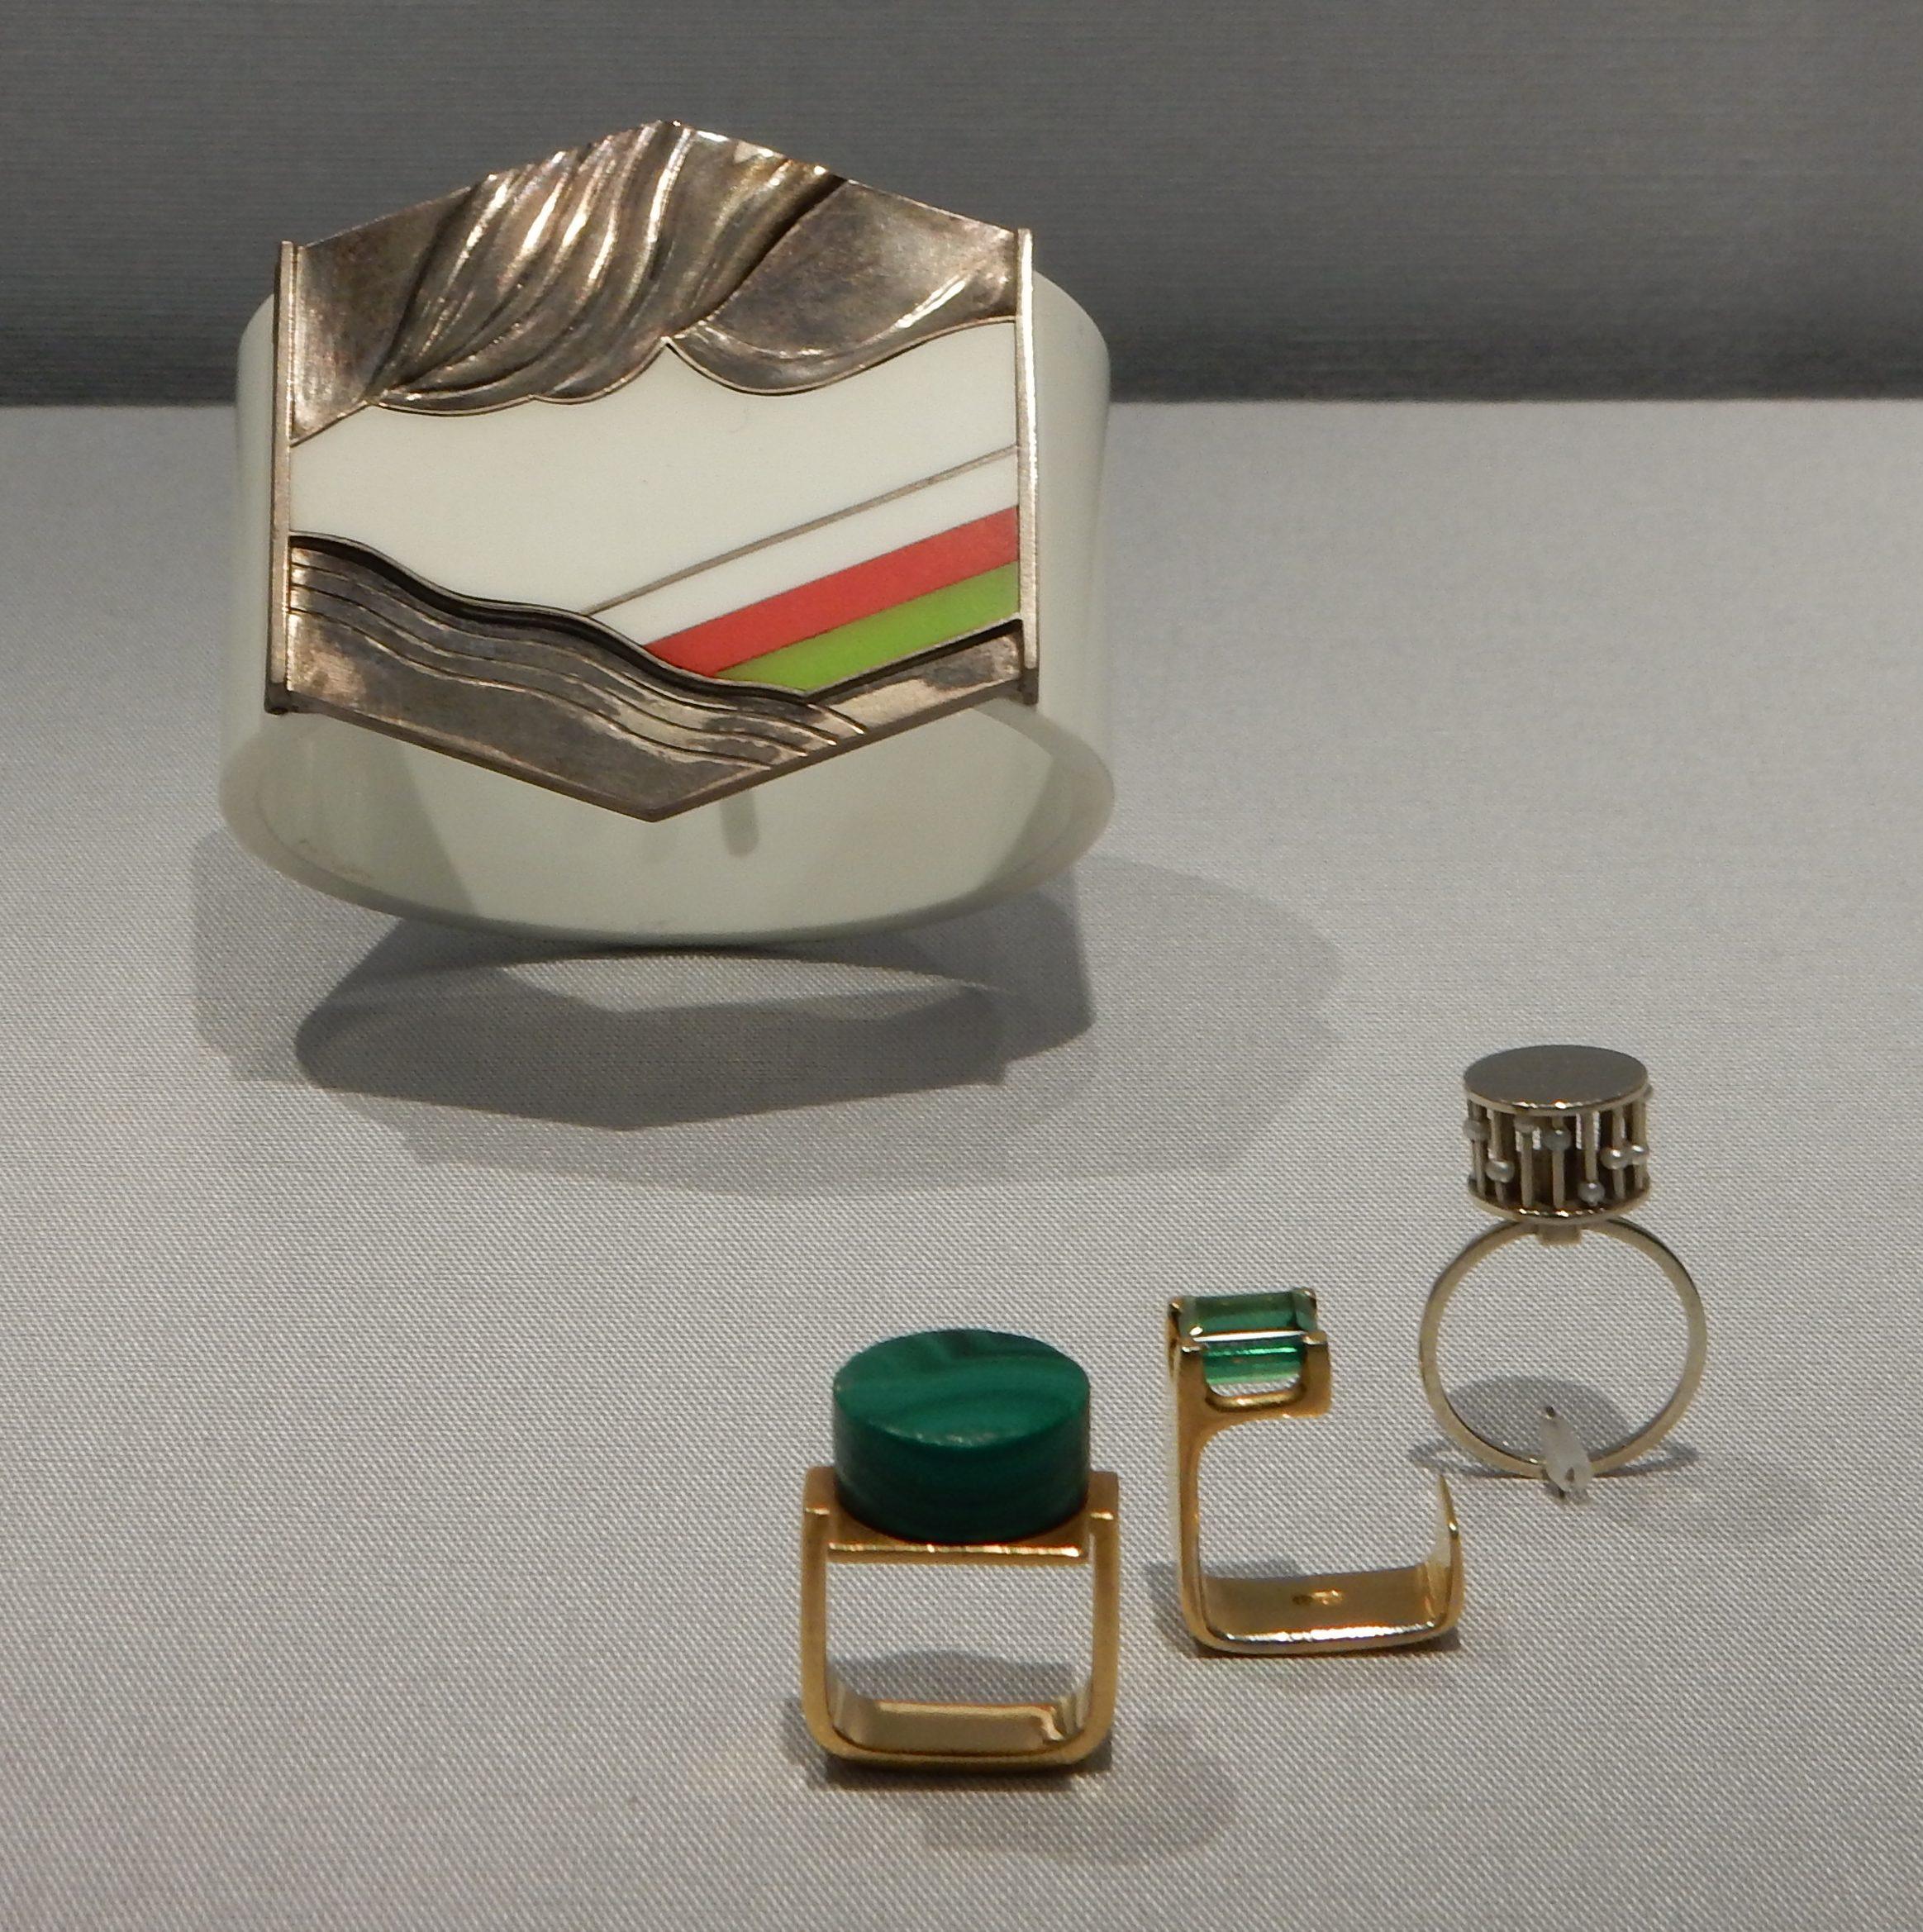 Gerd Rothman, armband, 1969, Monika Backhausen, ringen, circa 1960. Schmuckmuseum Pforzheim. Foto met dank aan Coert Peter Krabbe, september 2018©